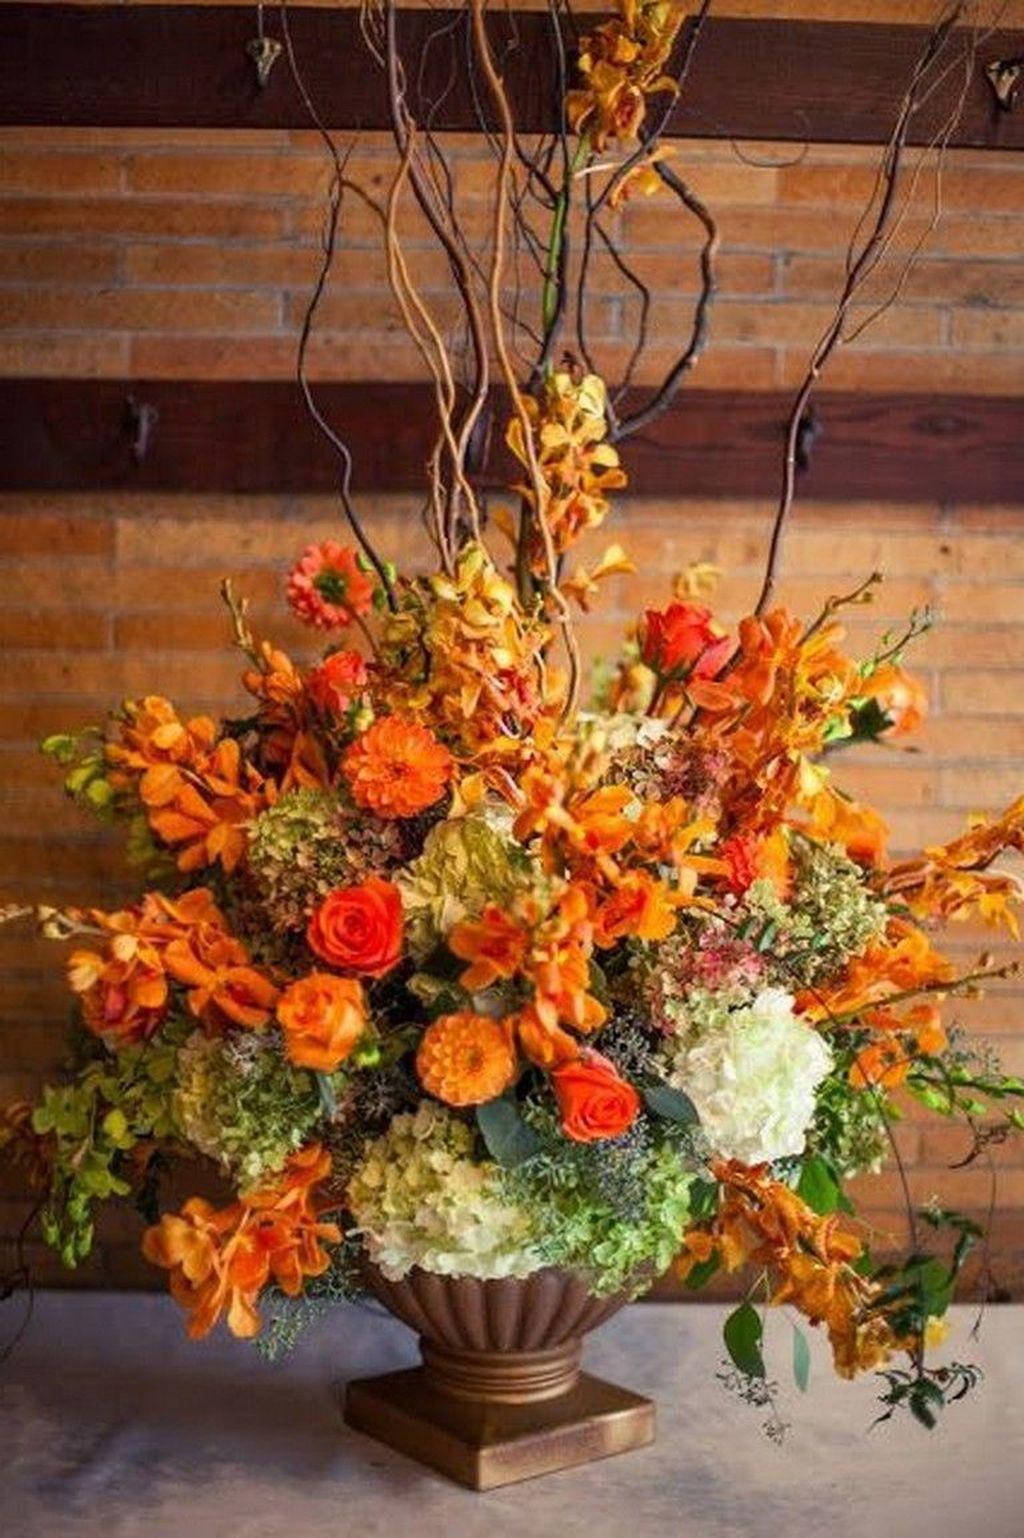 Beautiful Fall Flower Arrangement Design Ideas For Living Room Decor 16